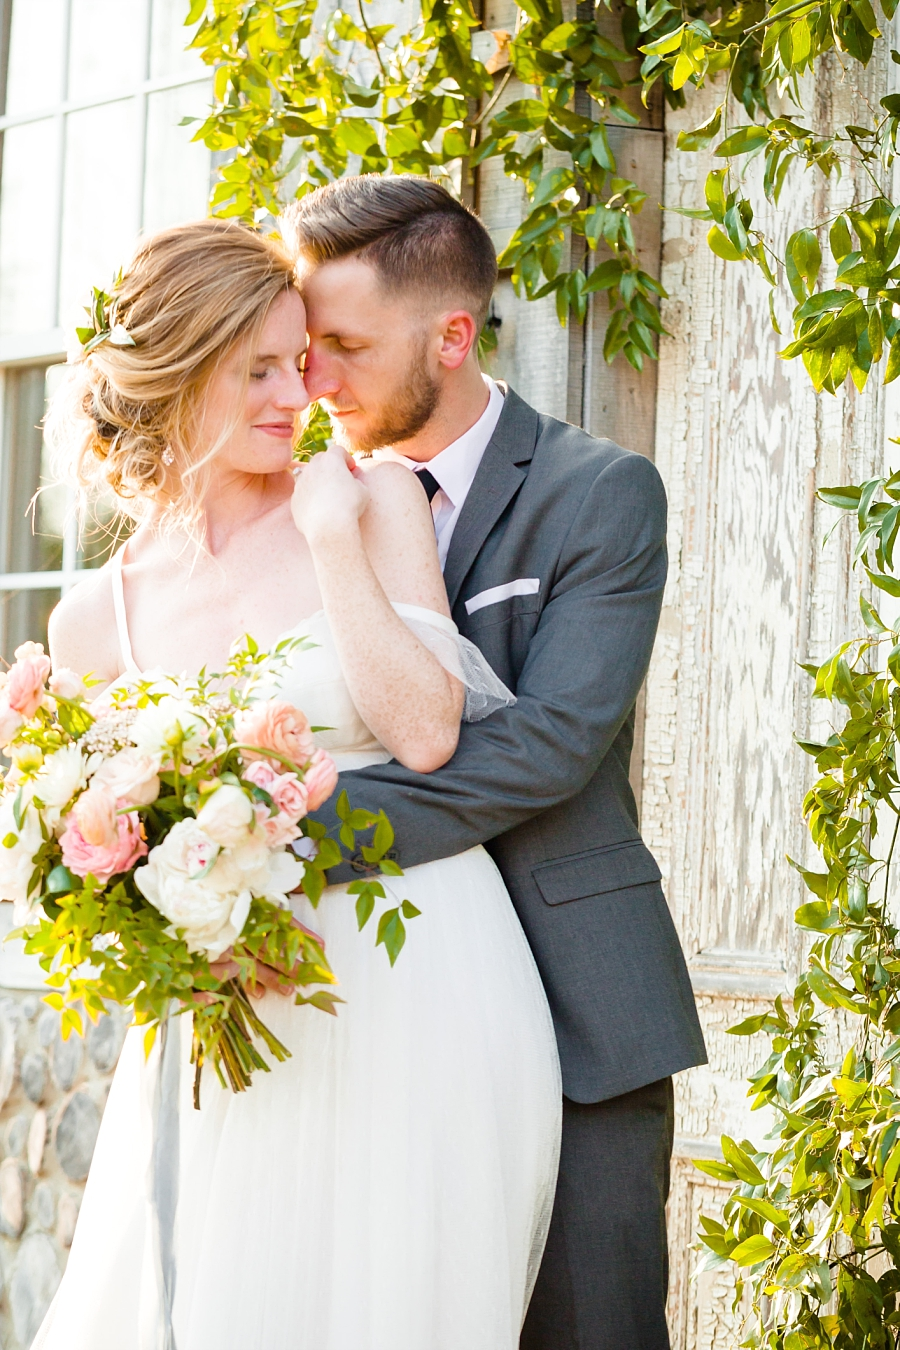 Stacy-Anderson-Photography-Nashville-Houston-Destination-Wedding-Photographer_0023-1.jpg